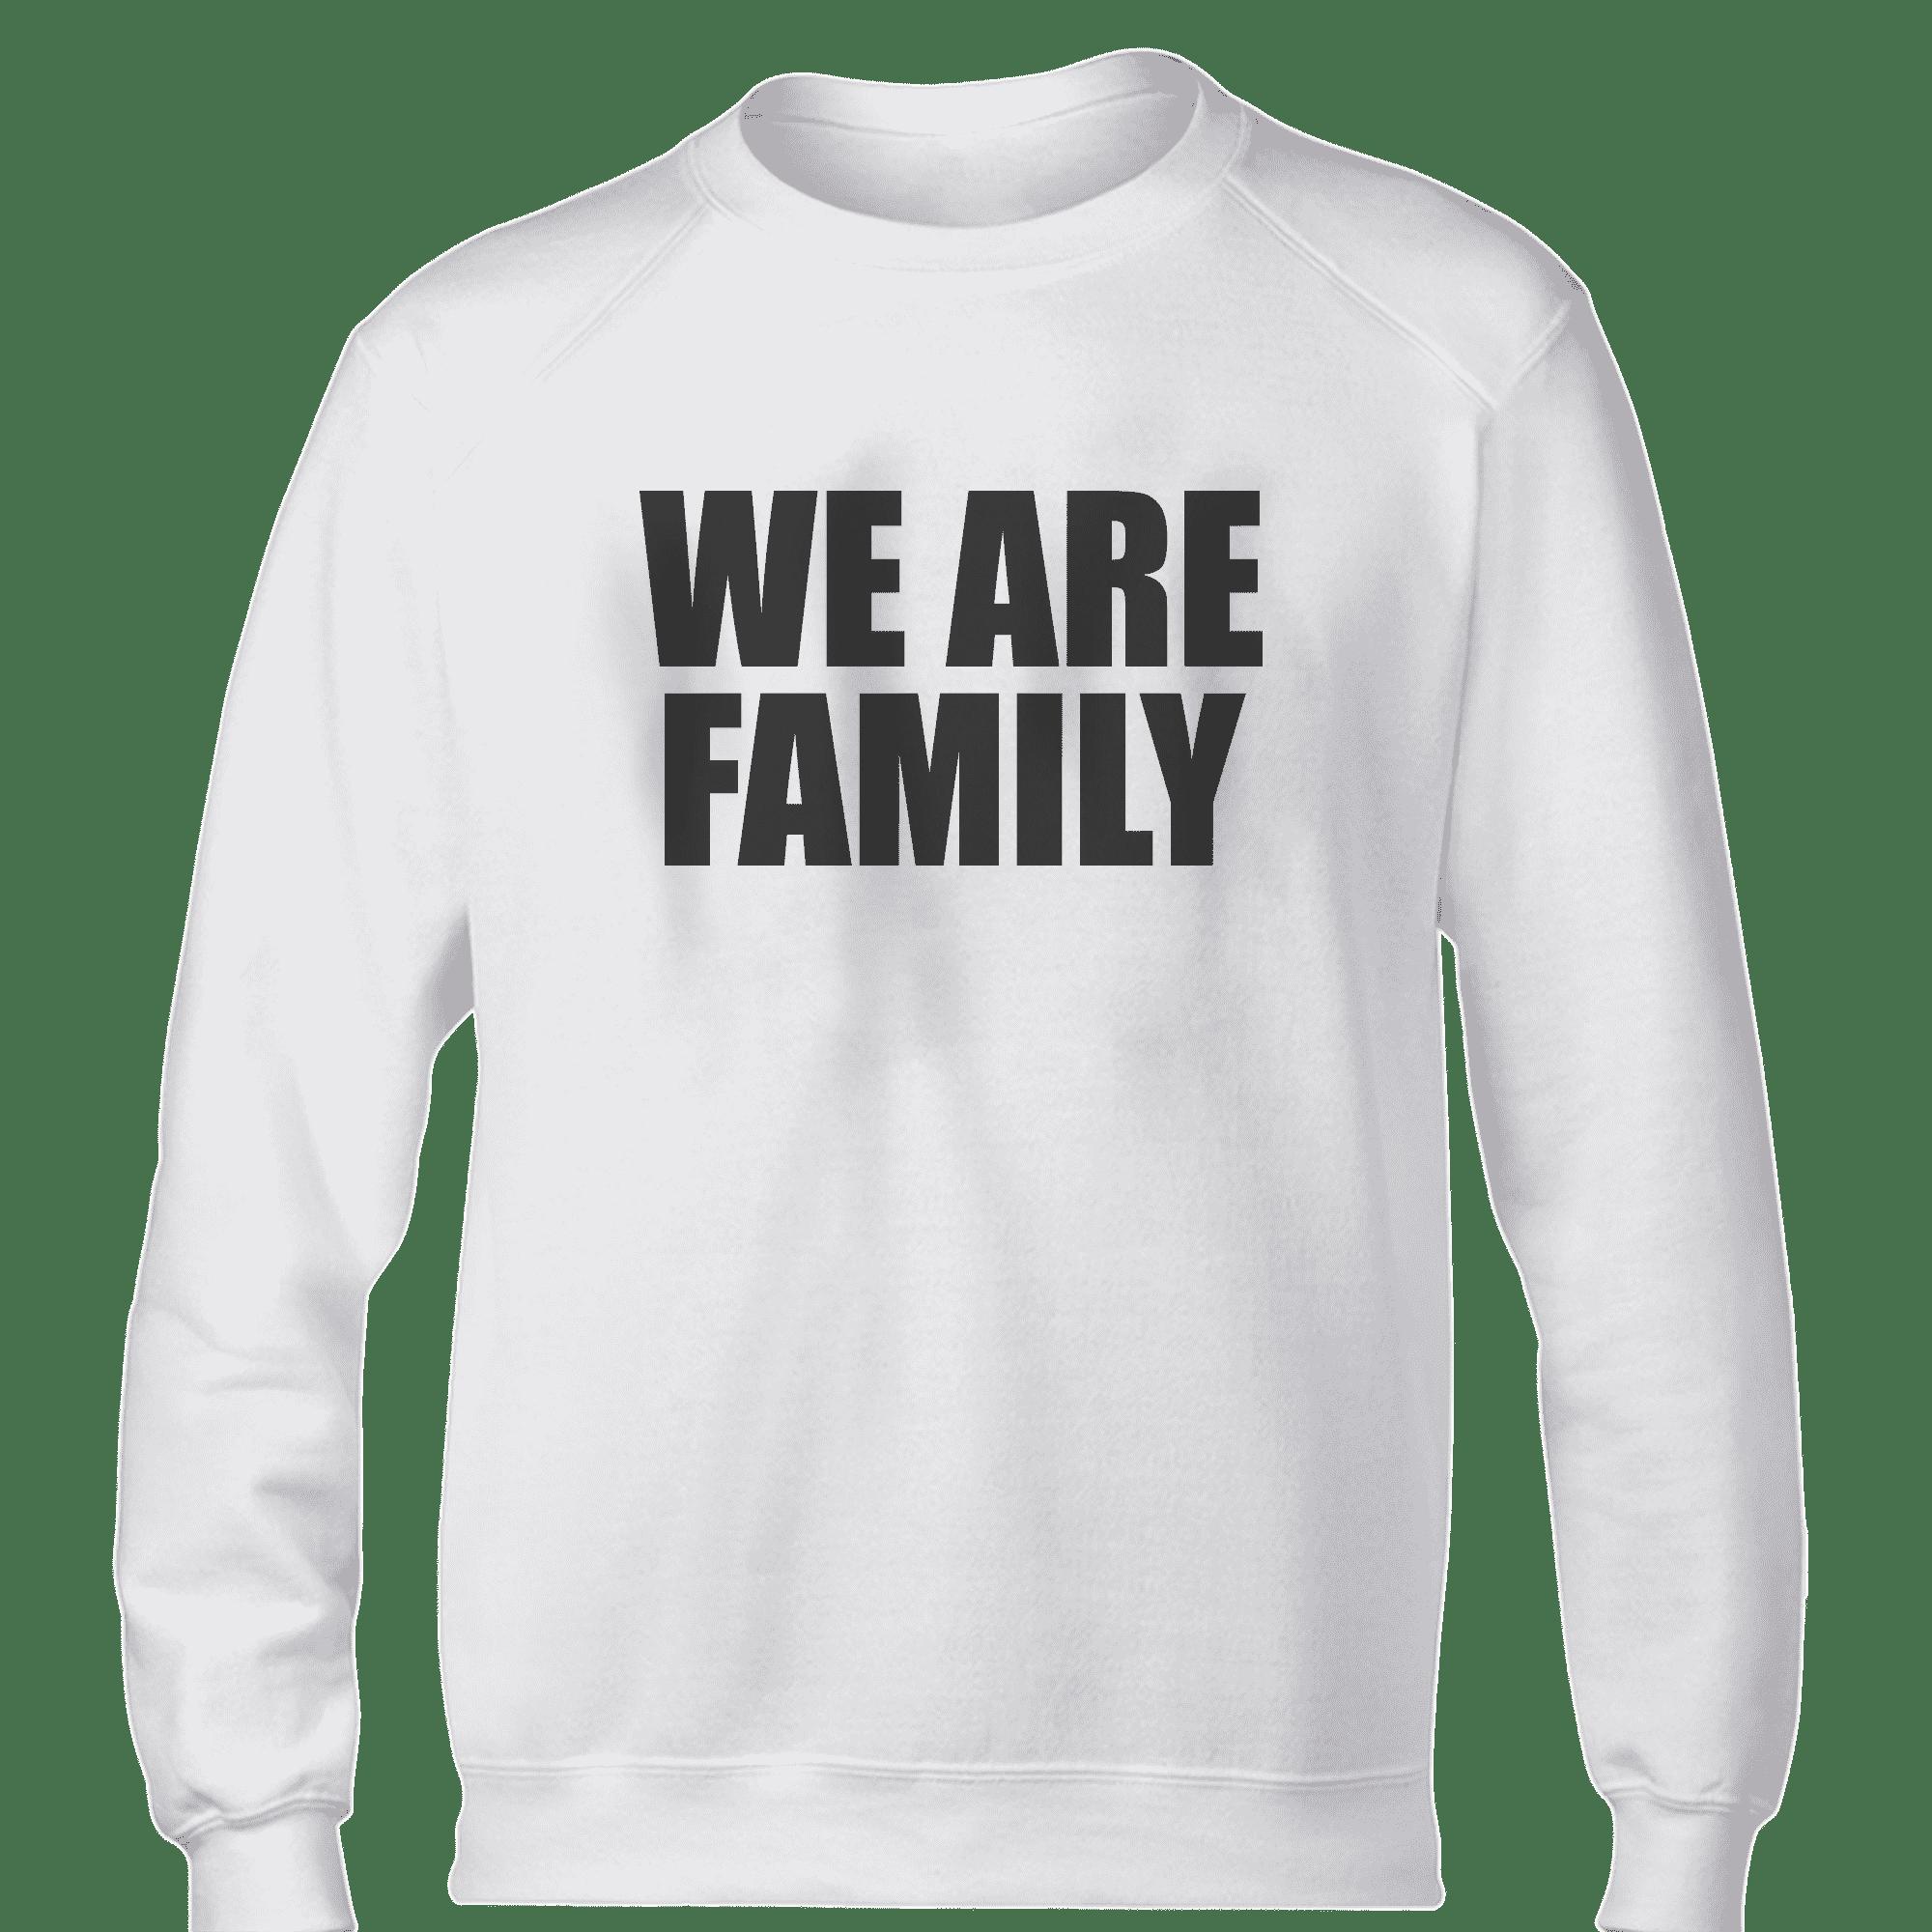 We Are Family Basic (BSC-WHT-KLS-WHT-NP-WSH-BSKTBLL-wefamily-Syh-542)